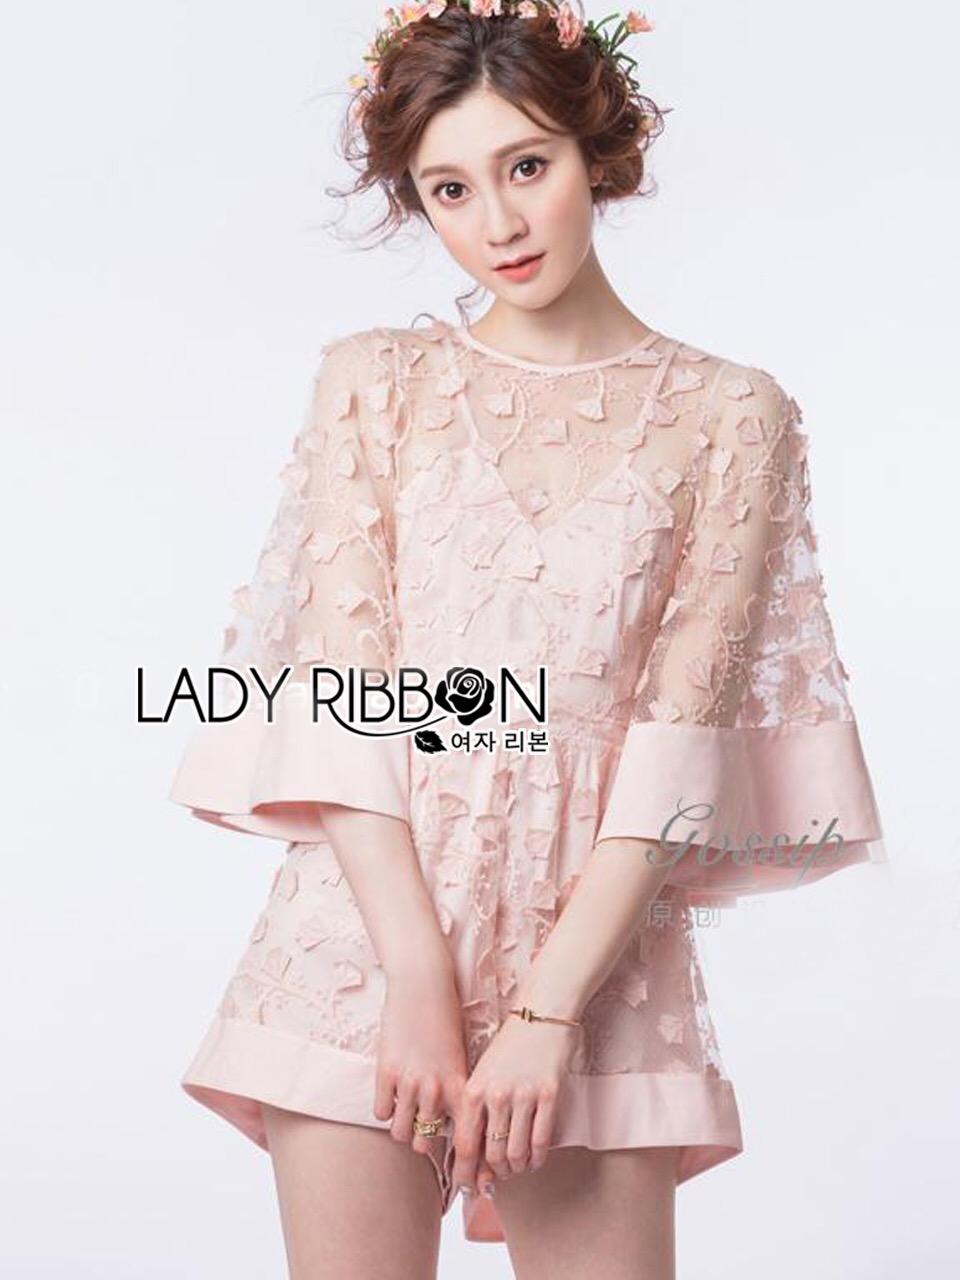 Lady Ribbon Korea Lady Ribbon's Made &#x1F380 Lady Abigail Feminine Spring Floral Printed Dress Korea Playsuit